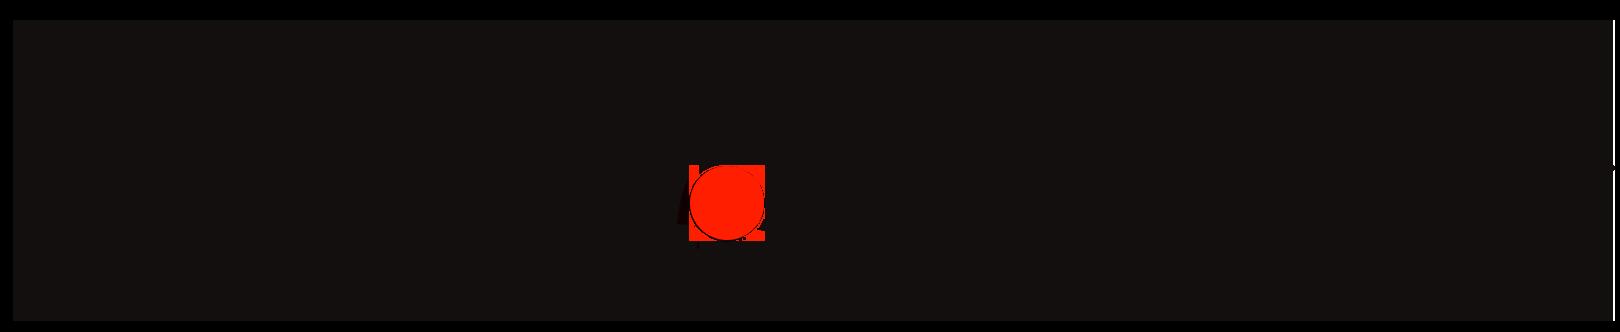 Viva Concepts Logo black.png